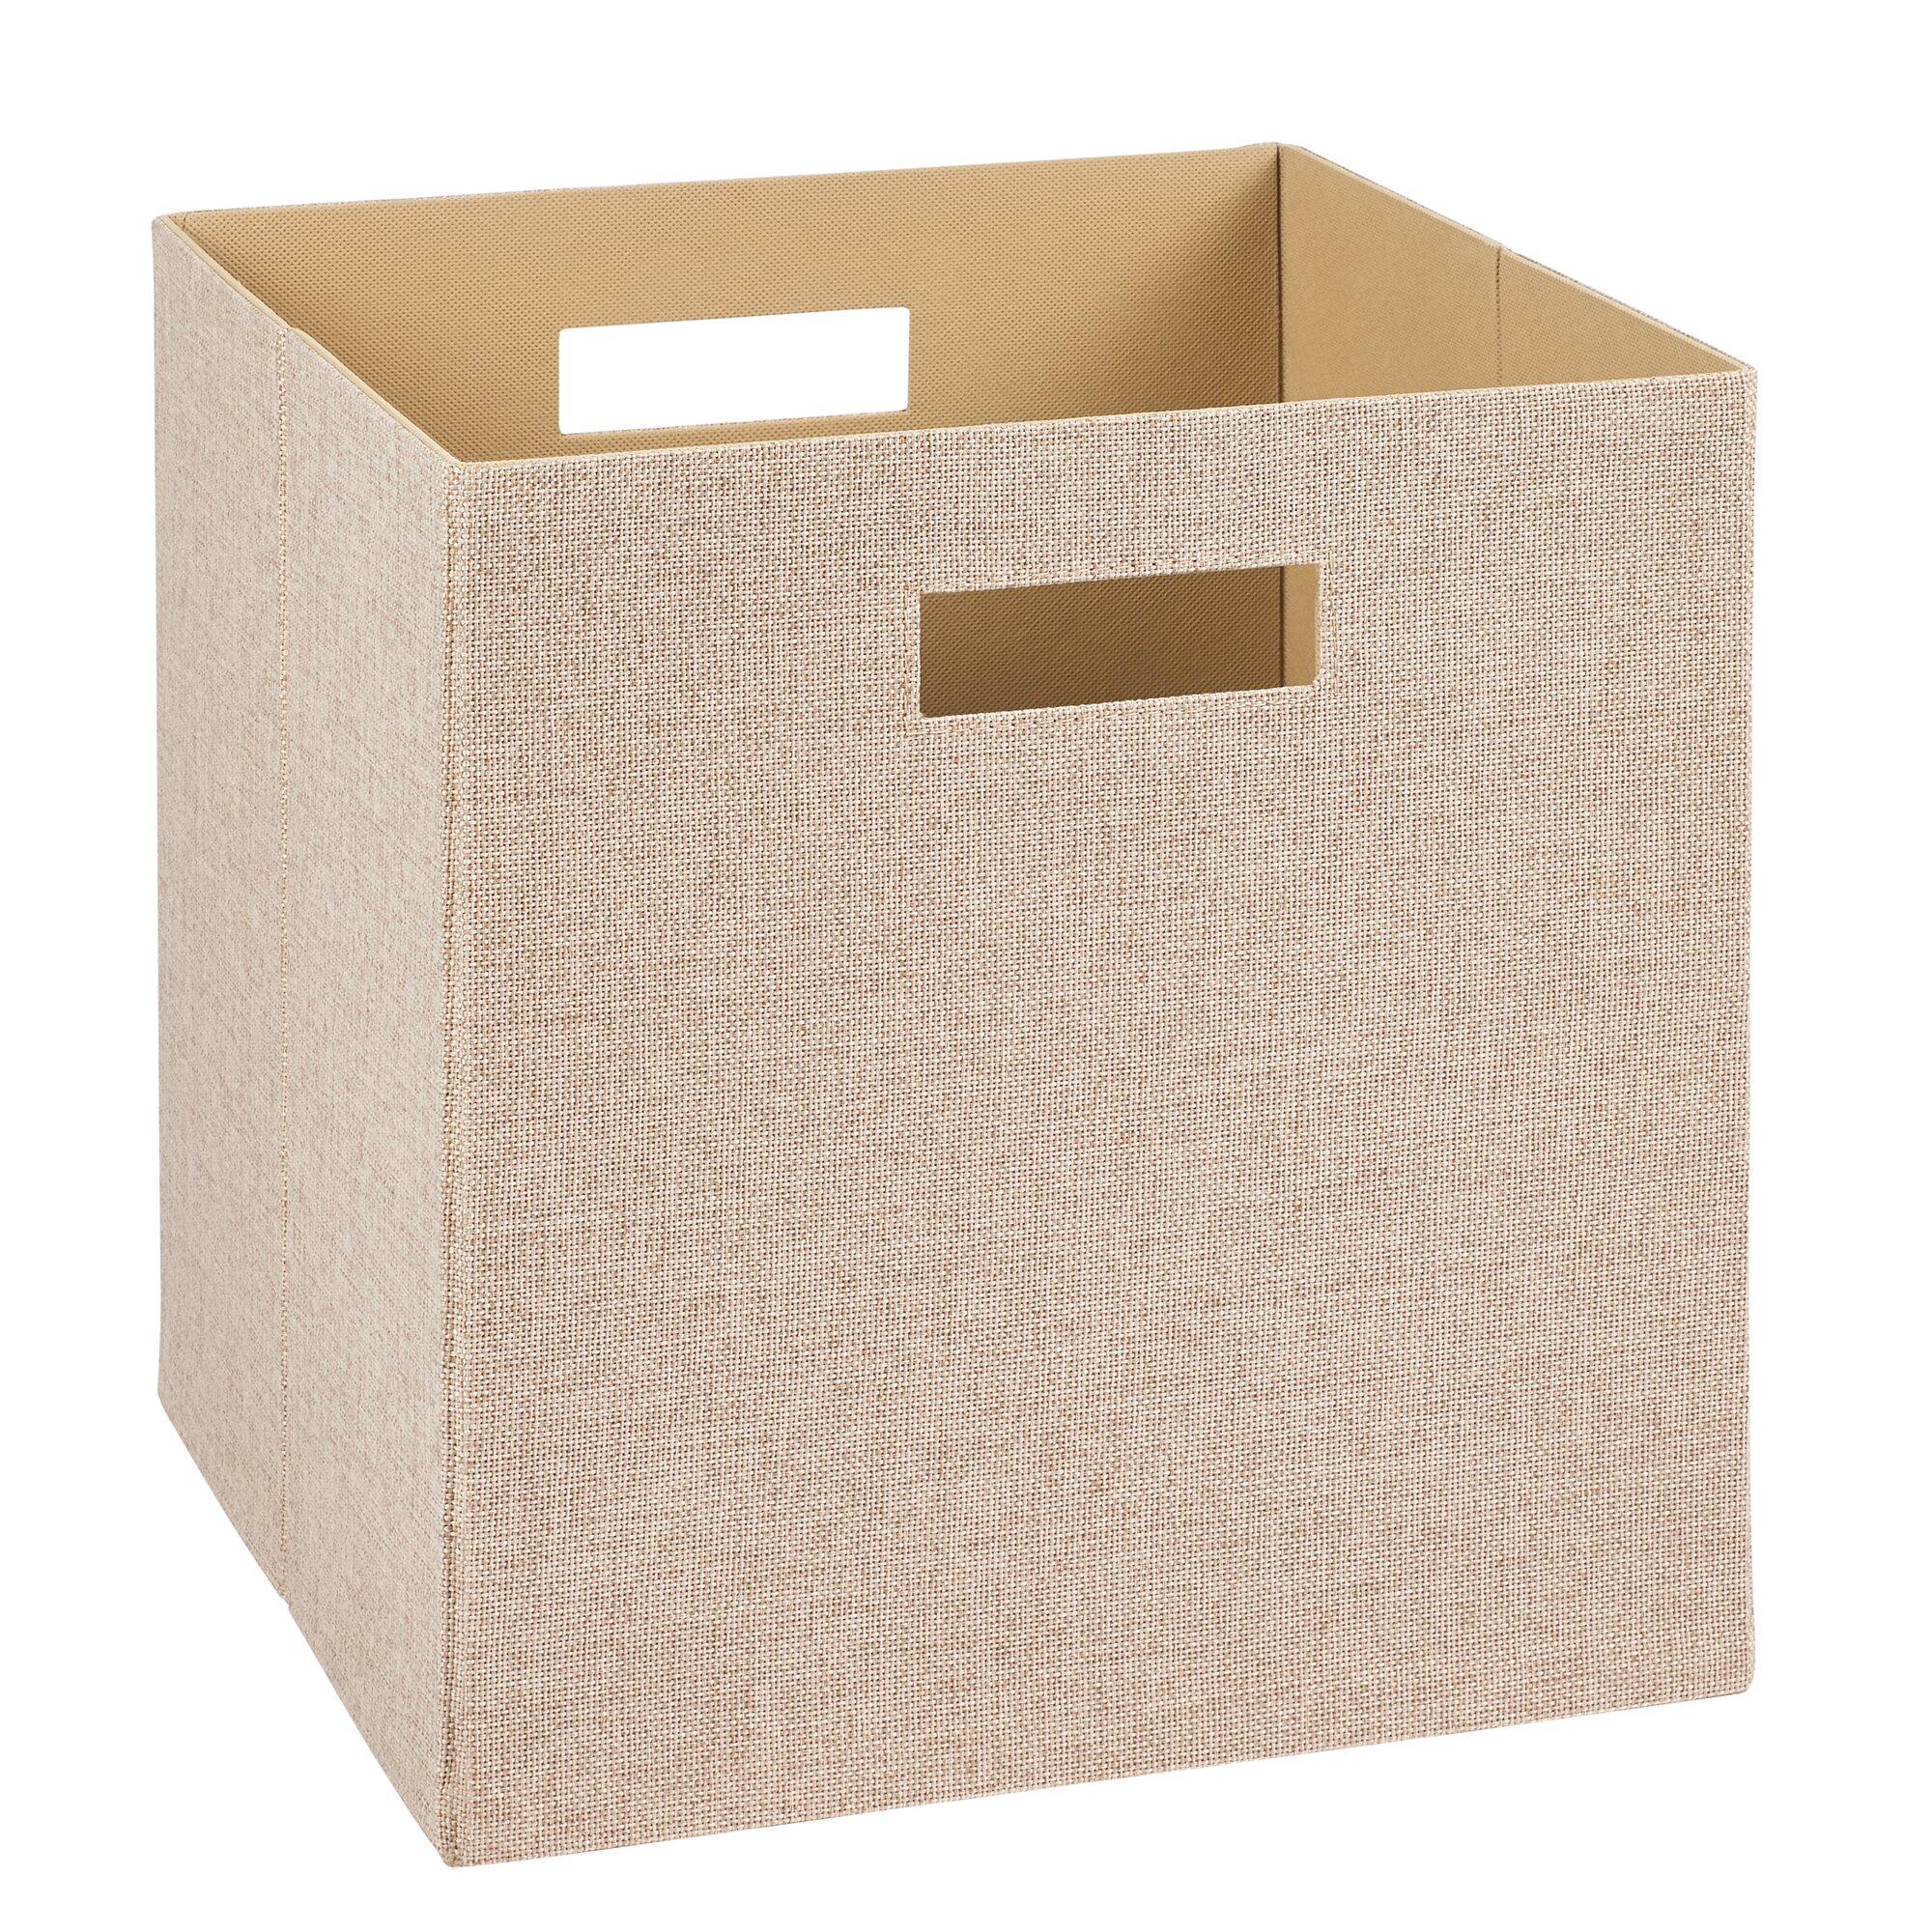 decorative storage fabric bins - Decorative Storage Baskets